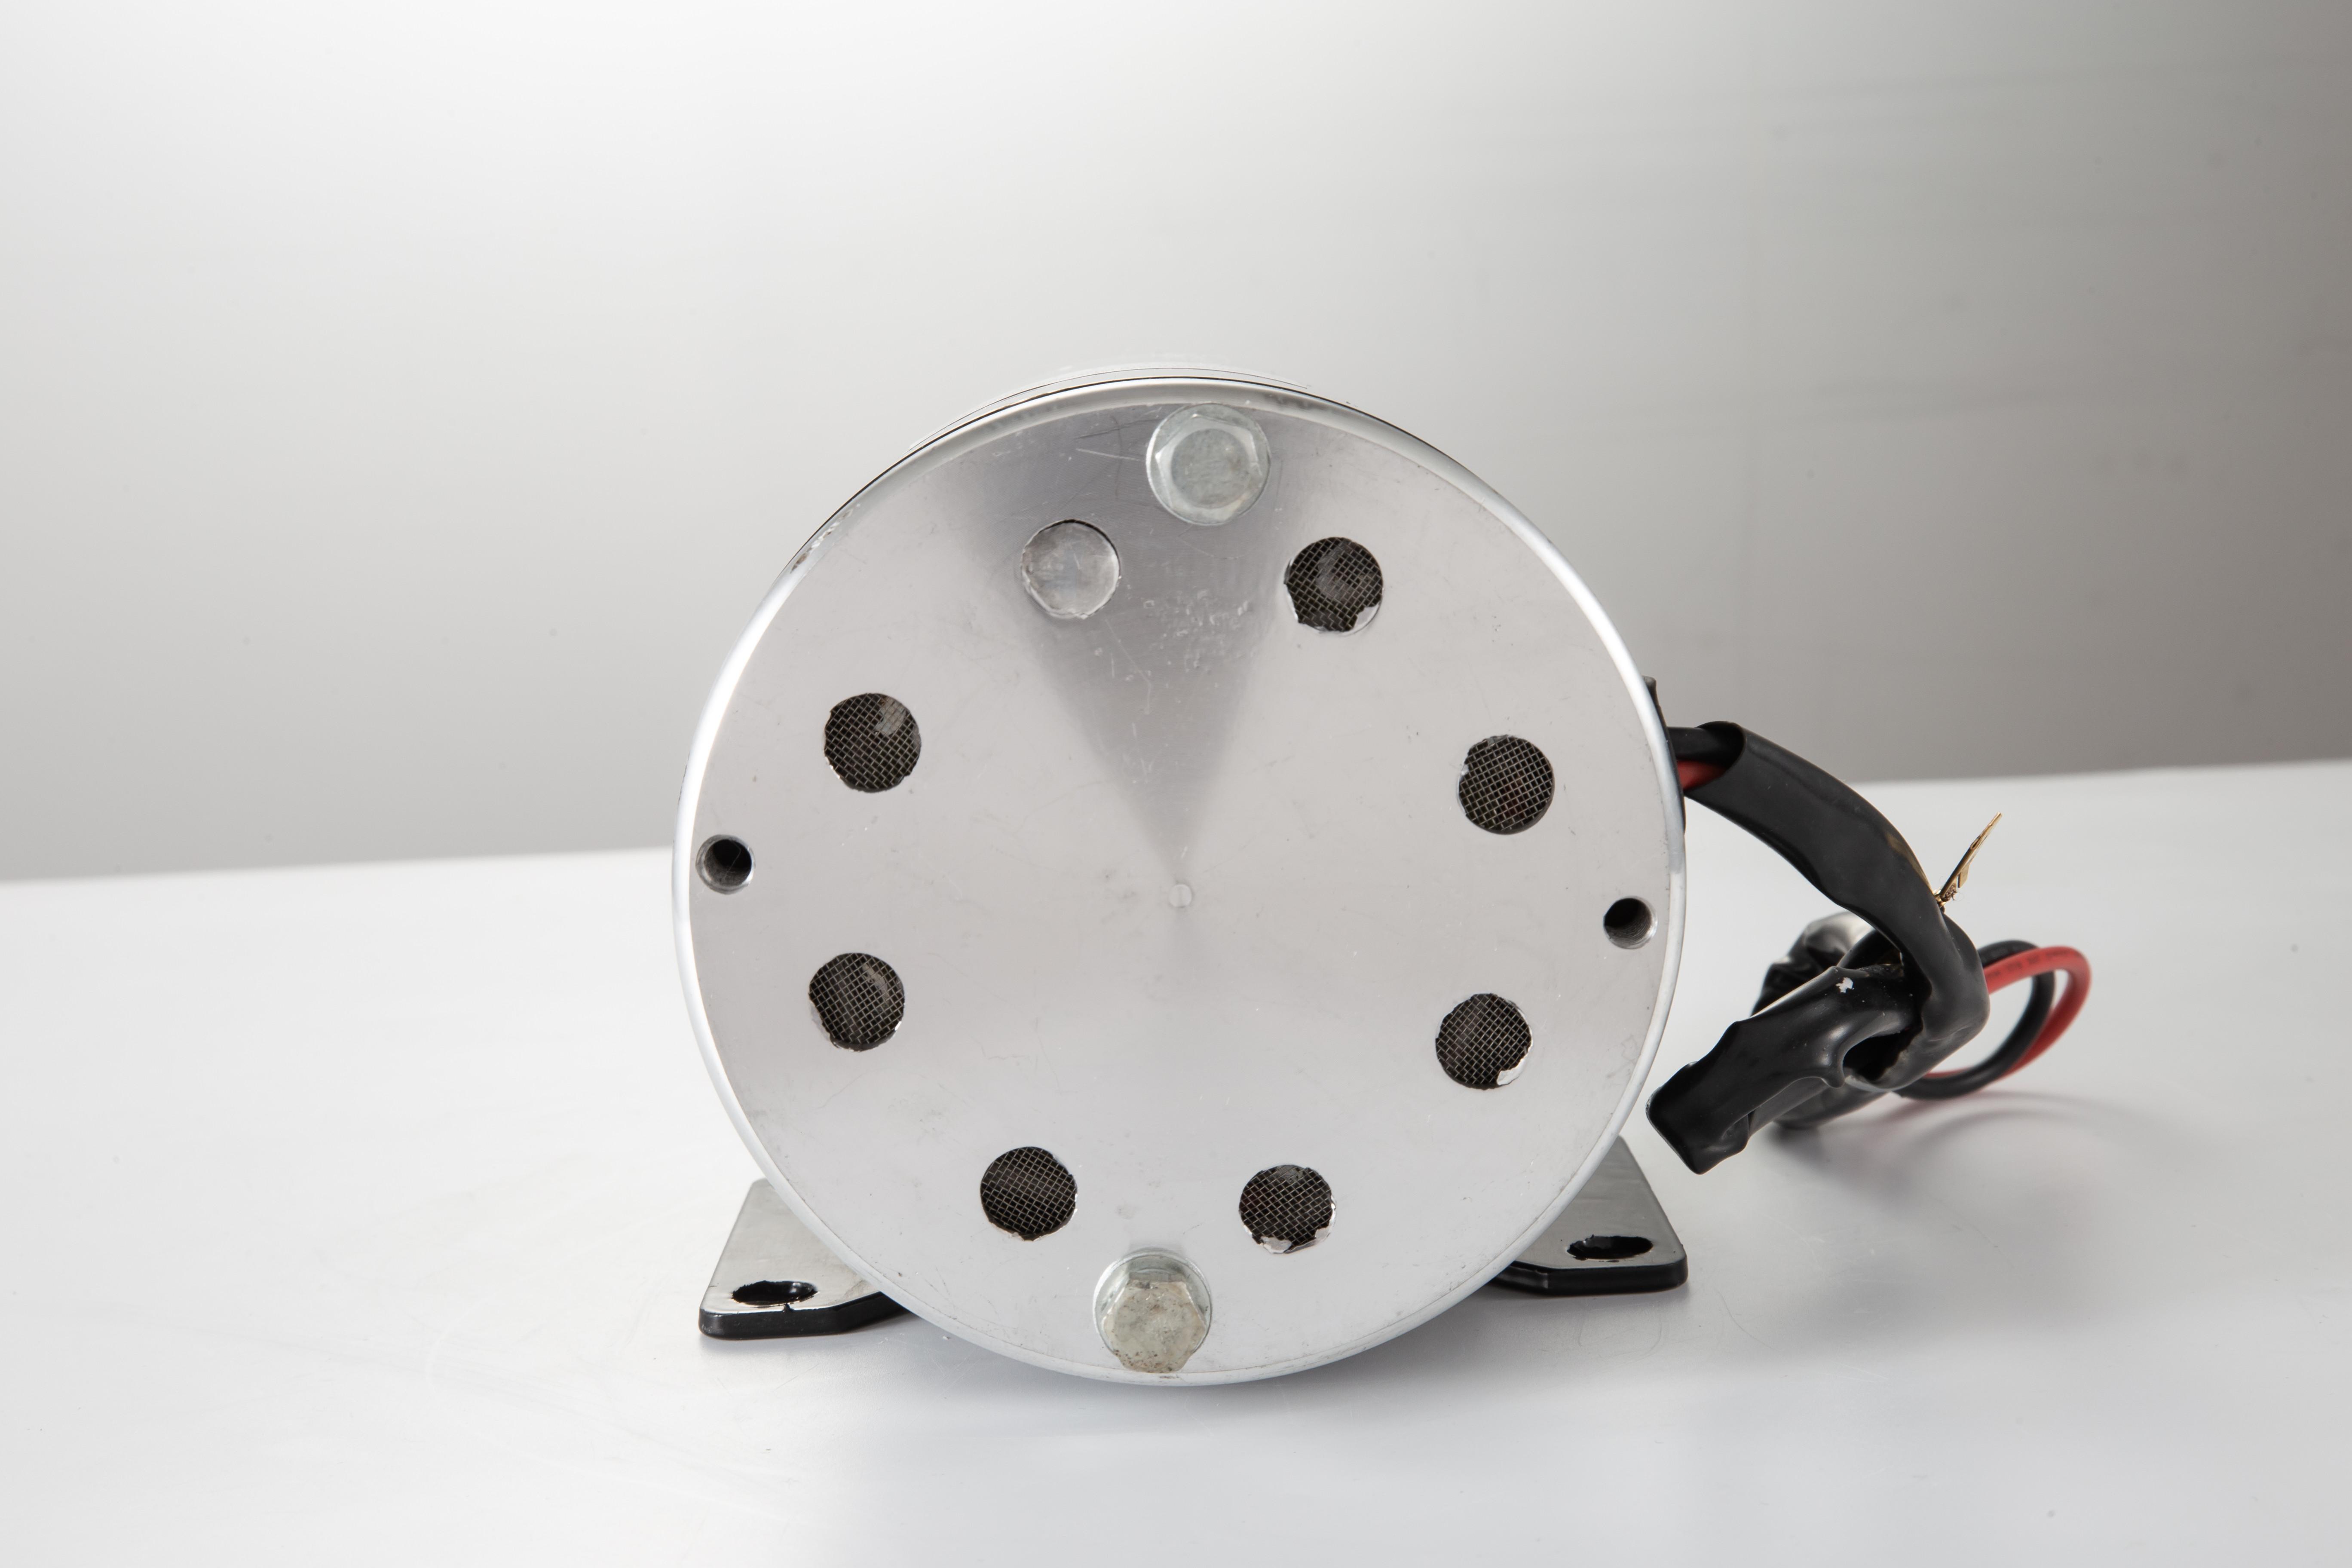 36v-Electric-Motor-controller-throttle-kit-f-Scooter-E-Scooter-ATV-Permanent thumbnail 42